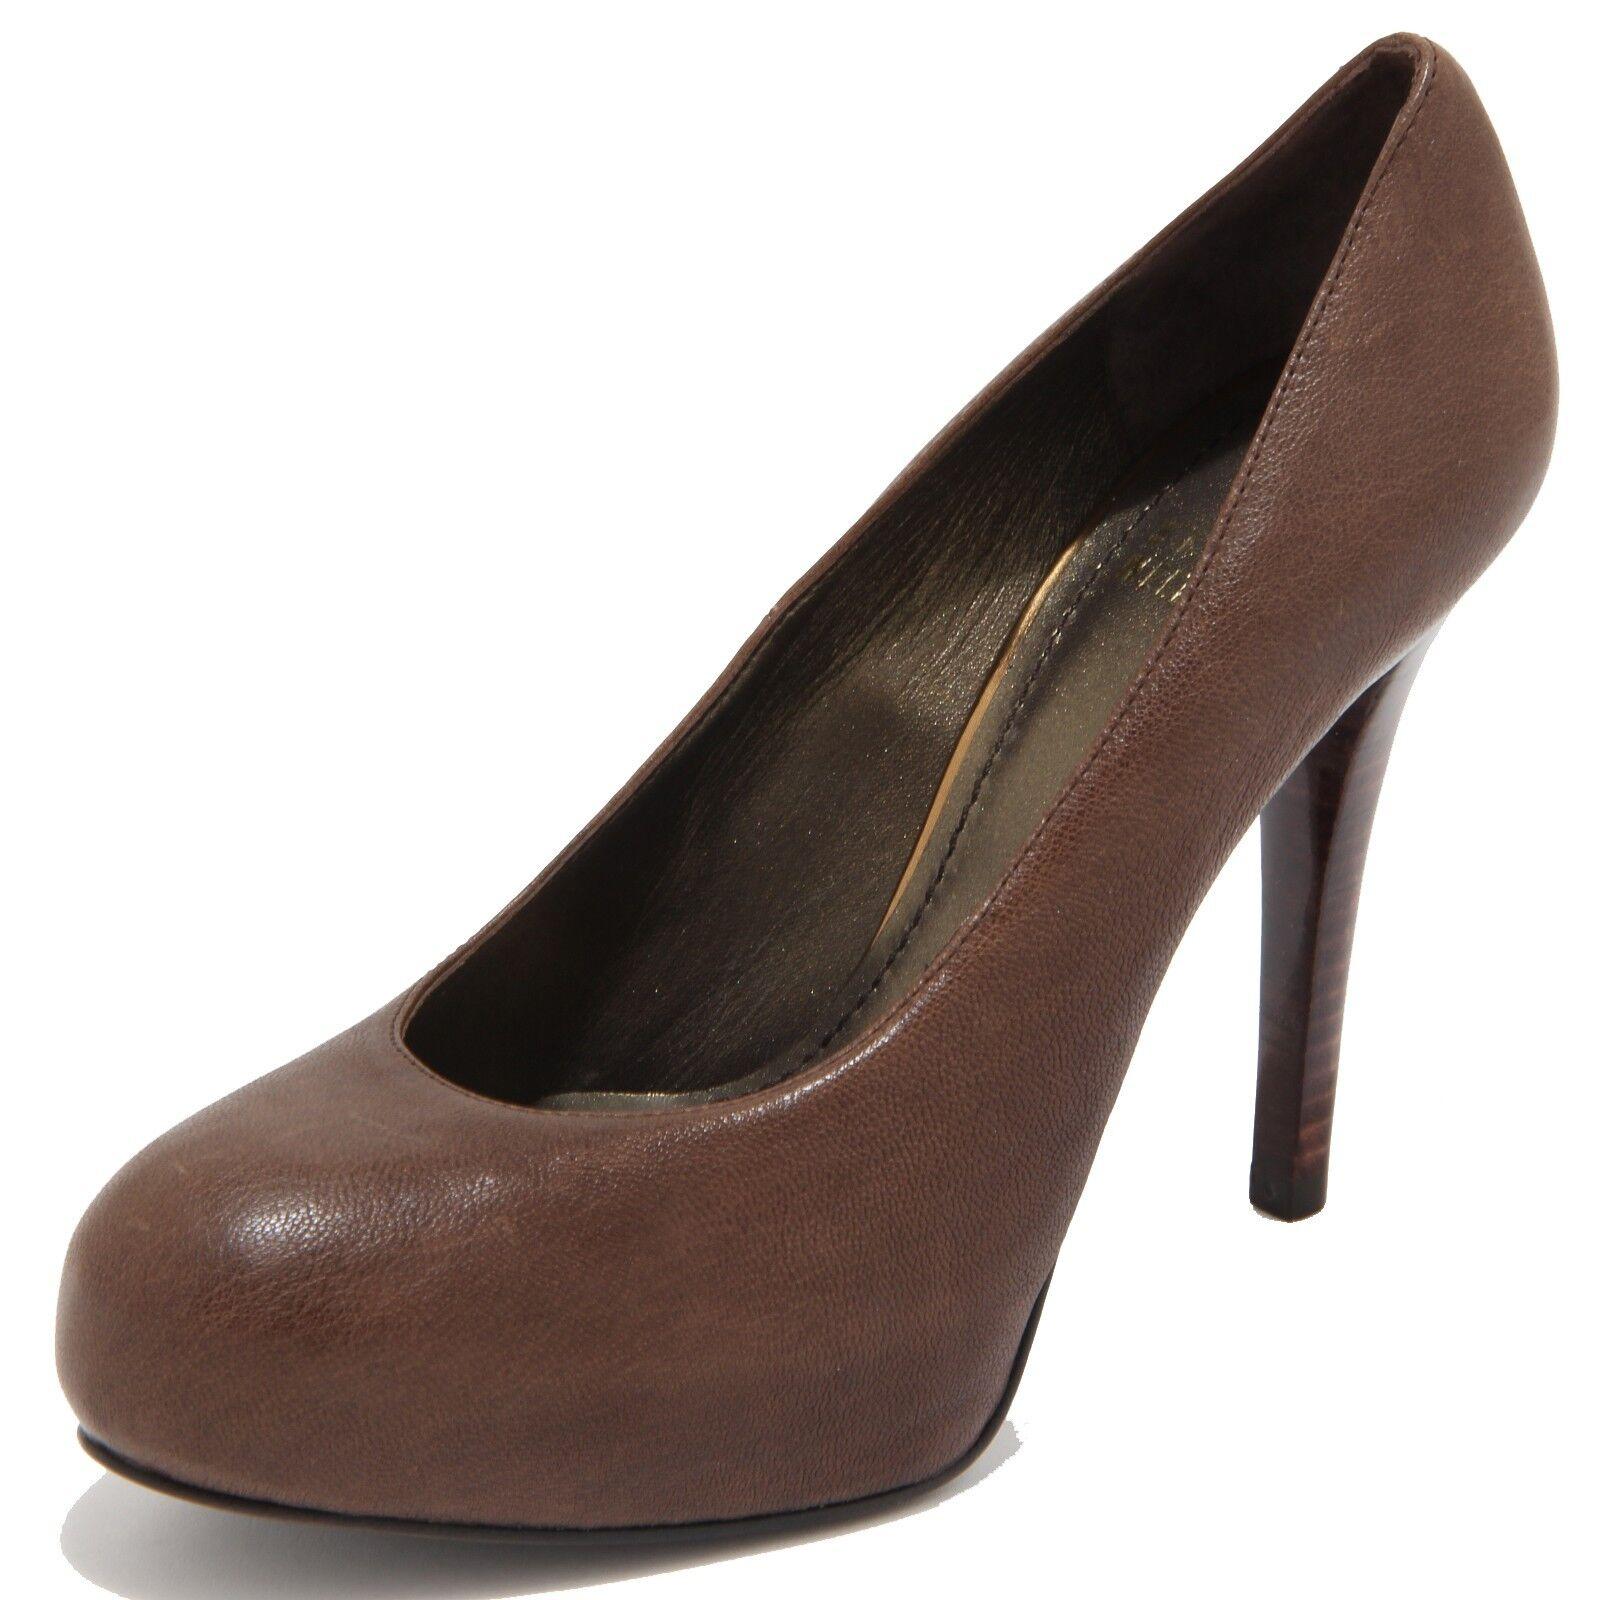 decollete scarpa STUART WEITZMAN scarpa decollete donna shoes women 25939 43229e